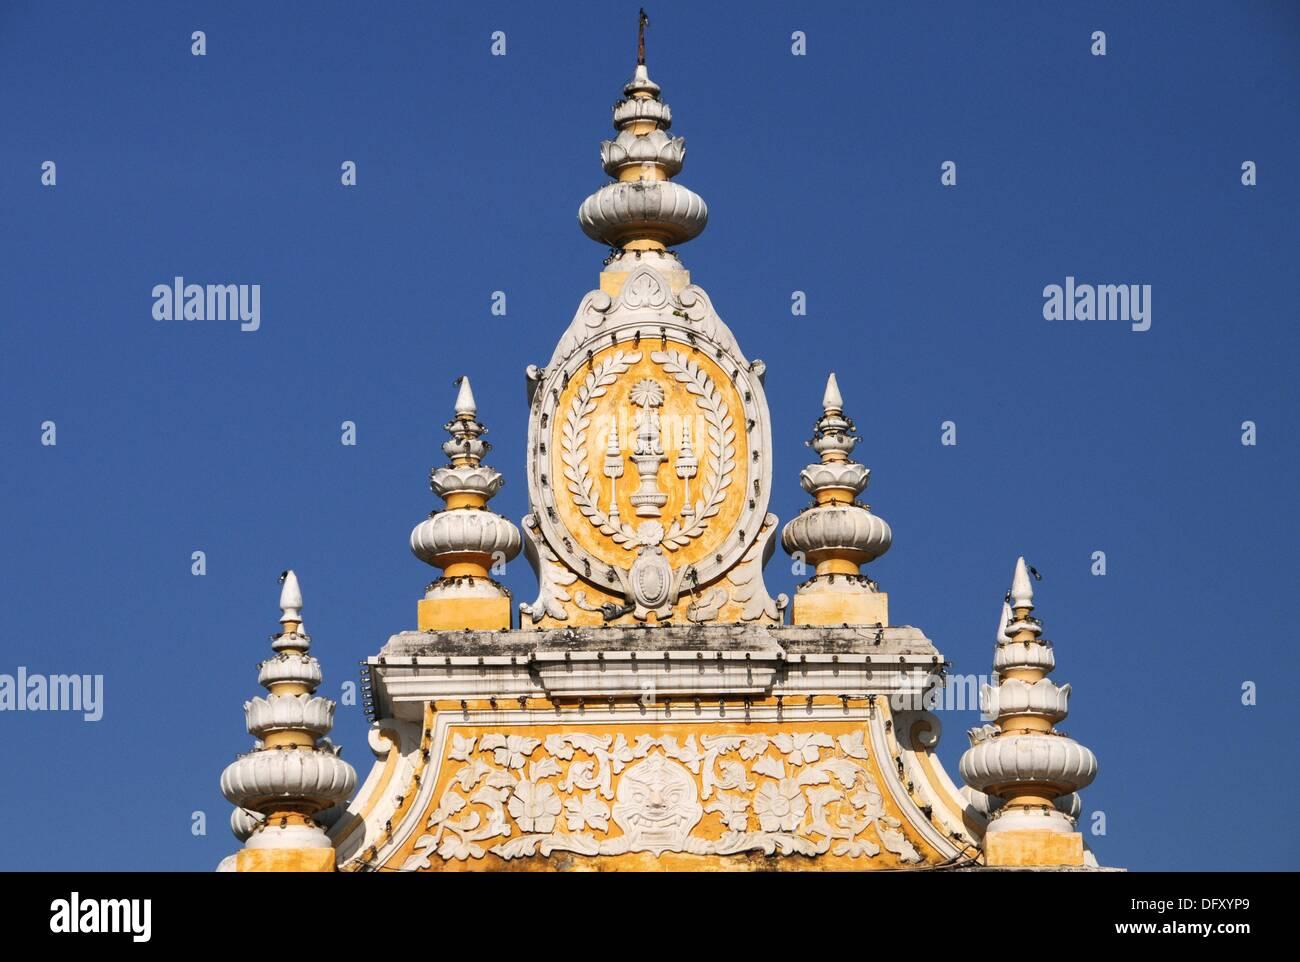 Embleme of the Kingdom of Cambodia - Stock Image